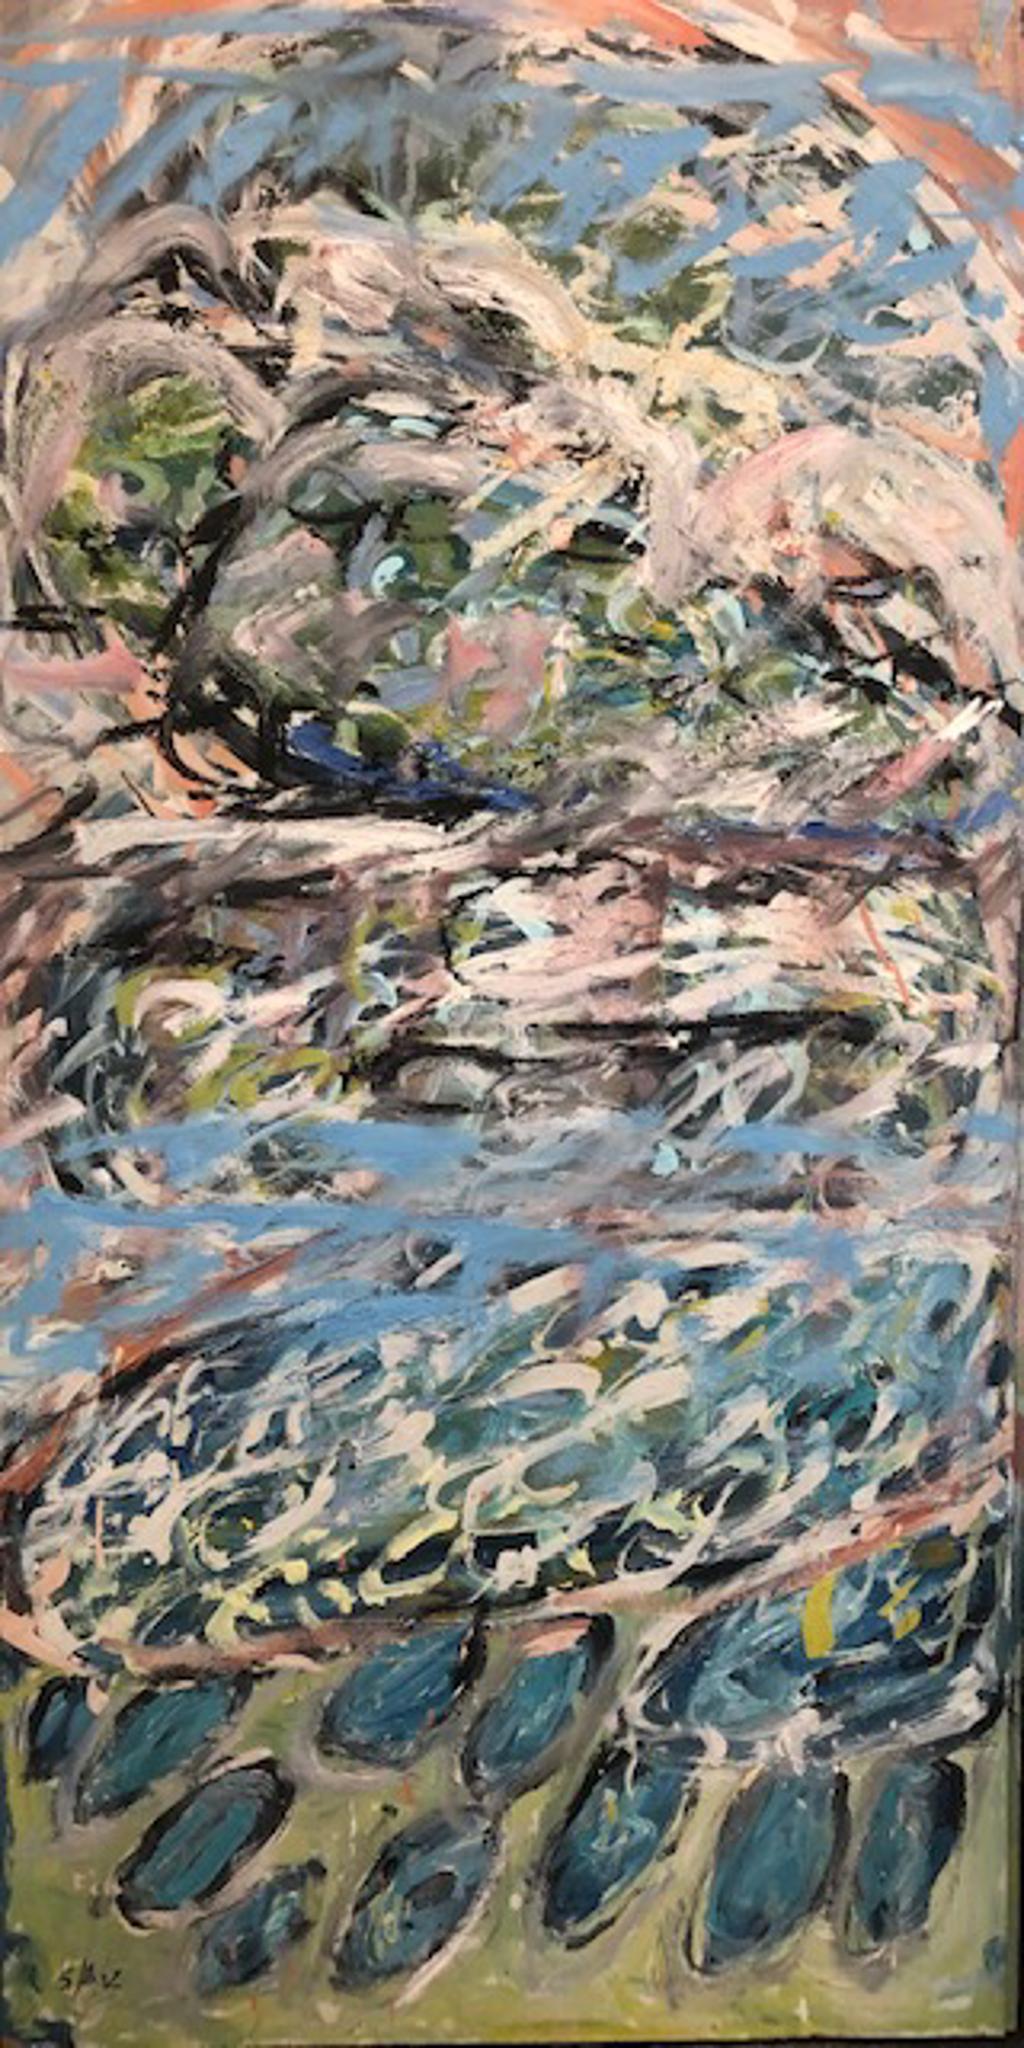 Spring 2 by Diana Brinson